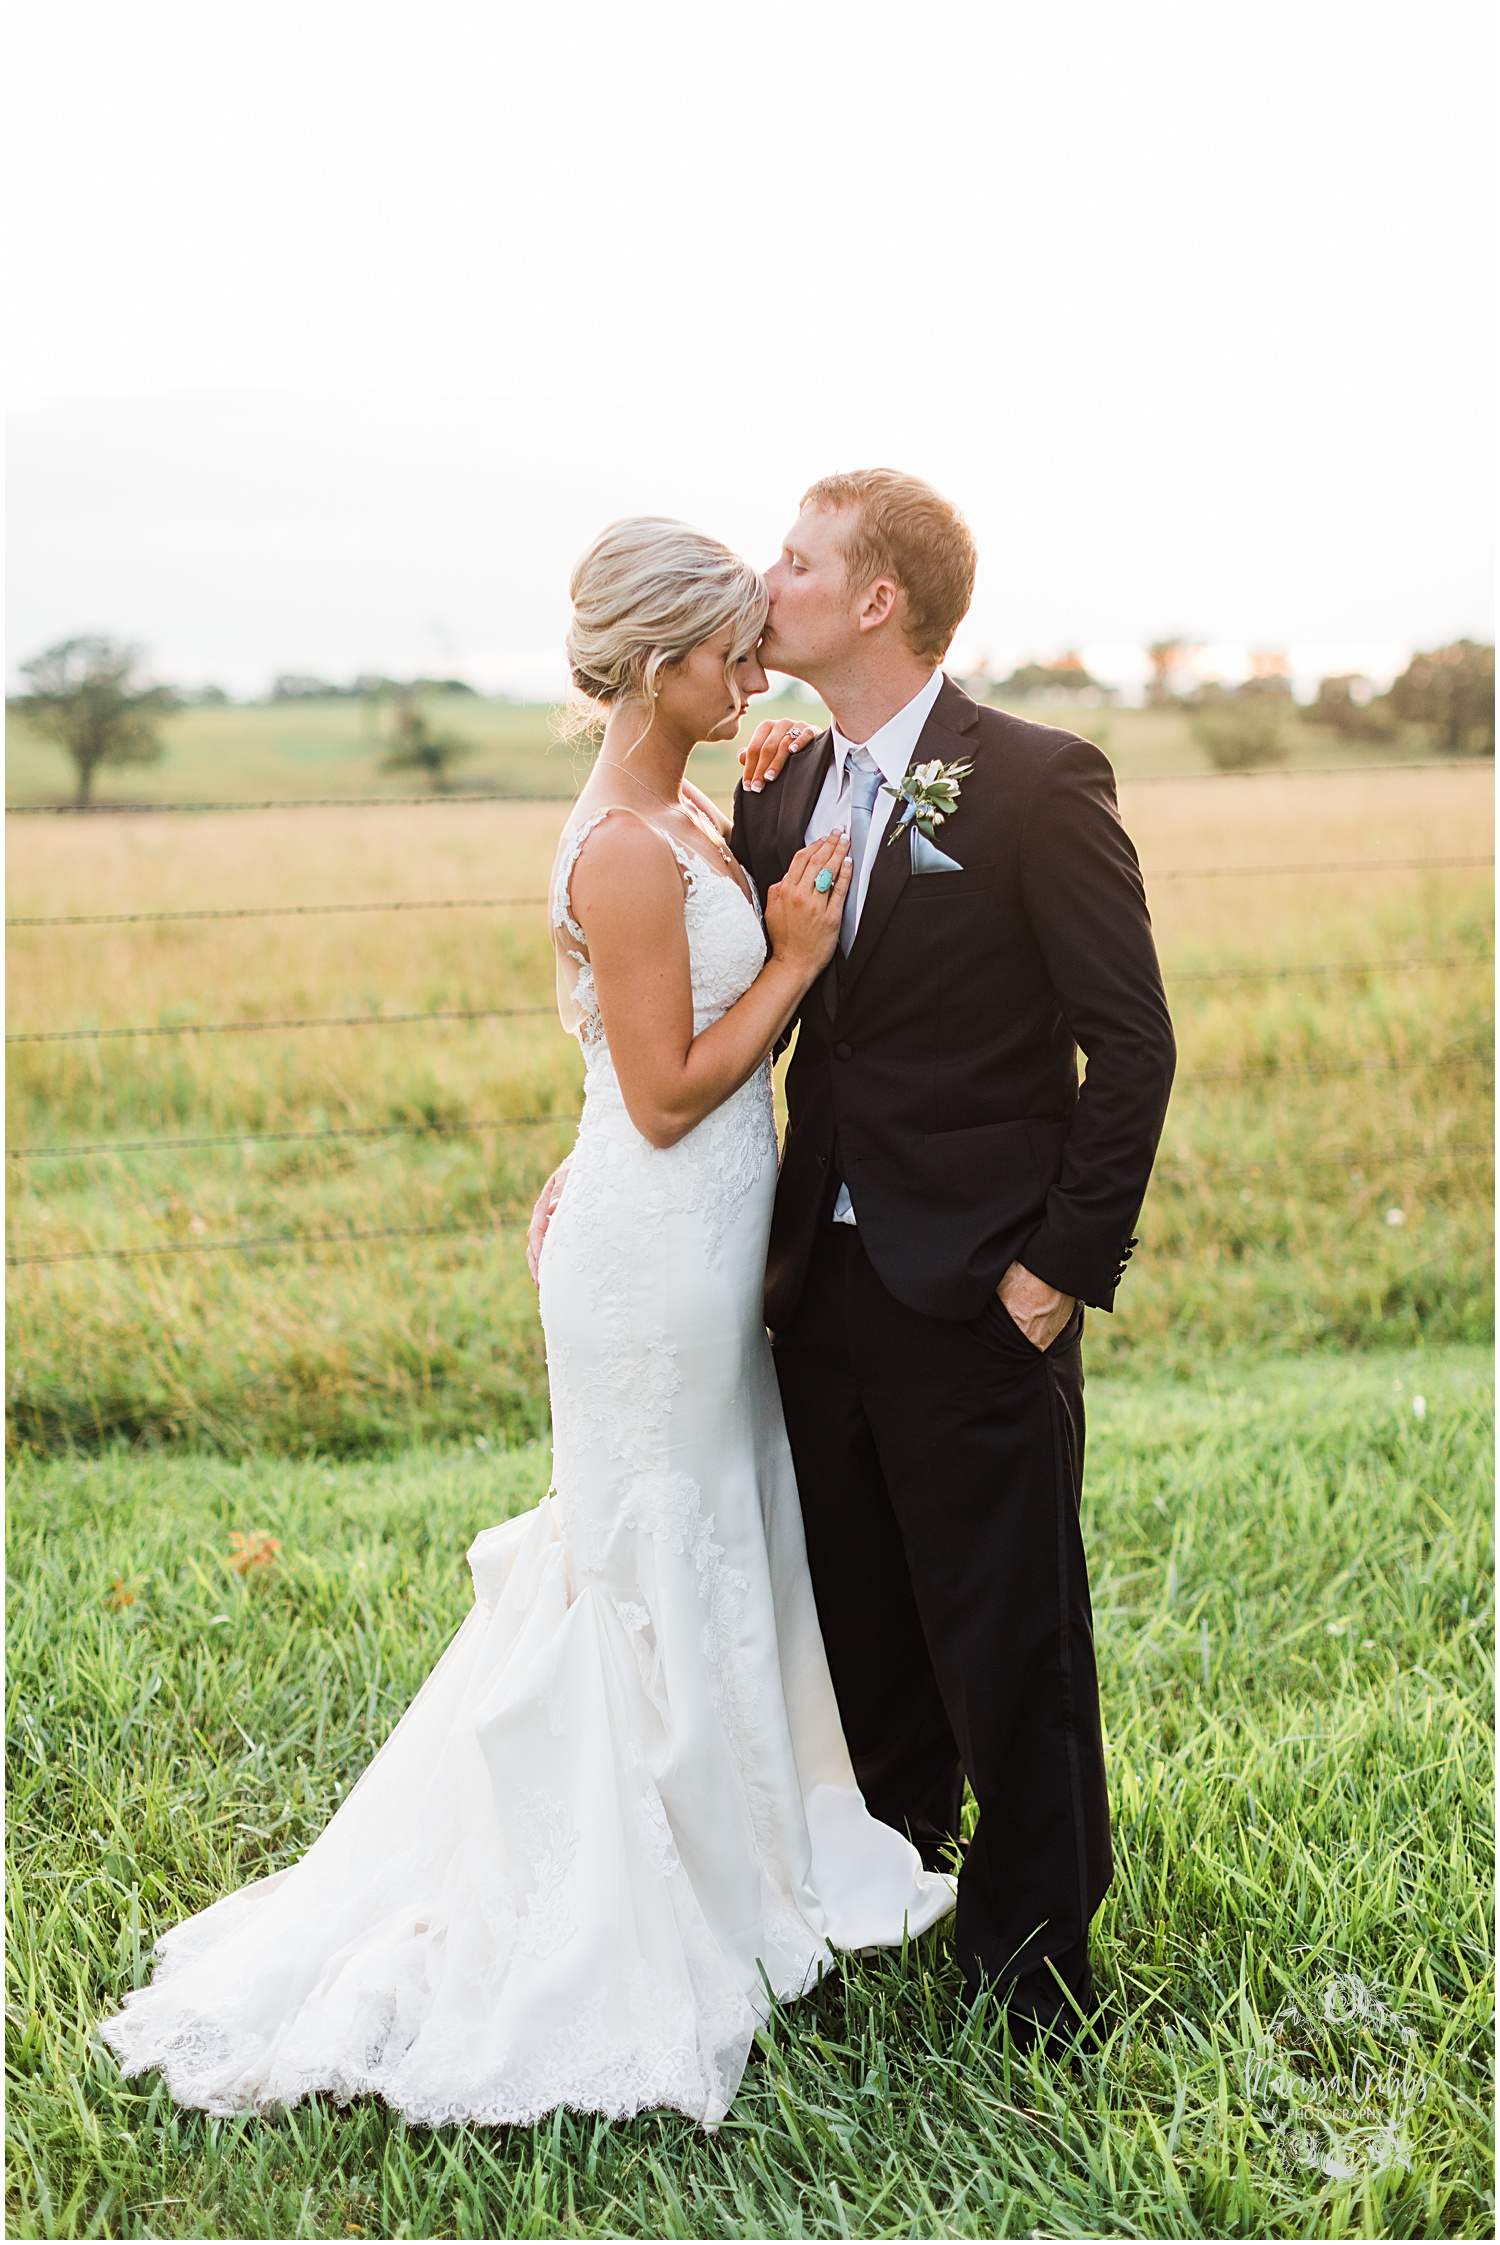 CHELSEA & BEN MARRIED BLOG  | MARISSA CRIBBS PHOTOGRAPHY_8633.jpg